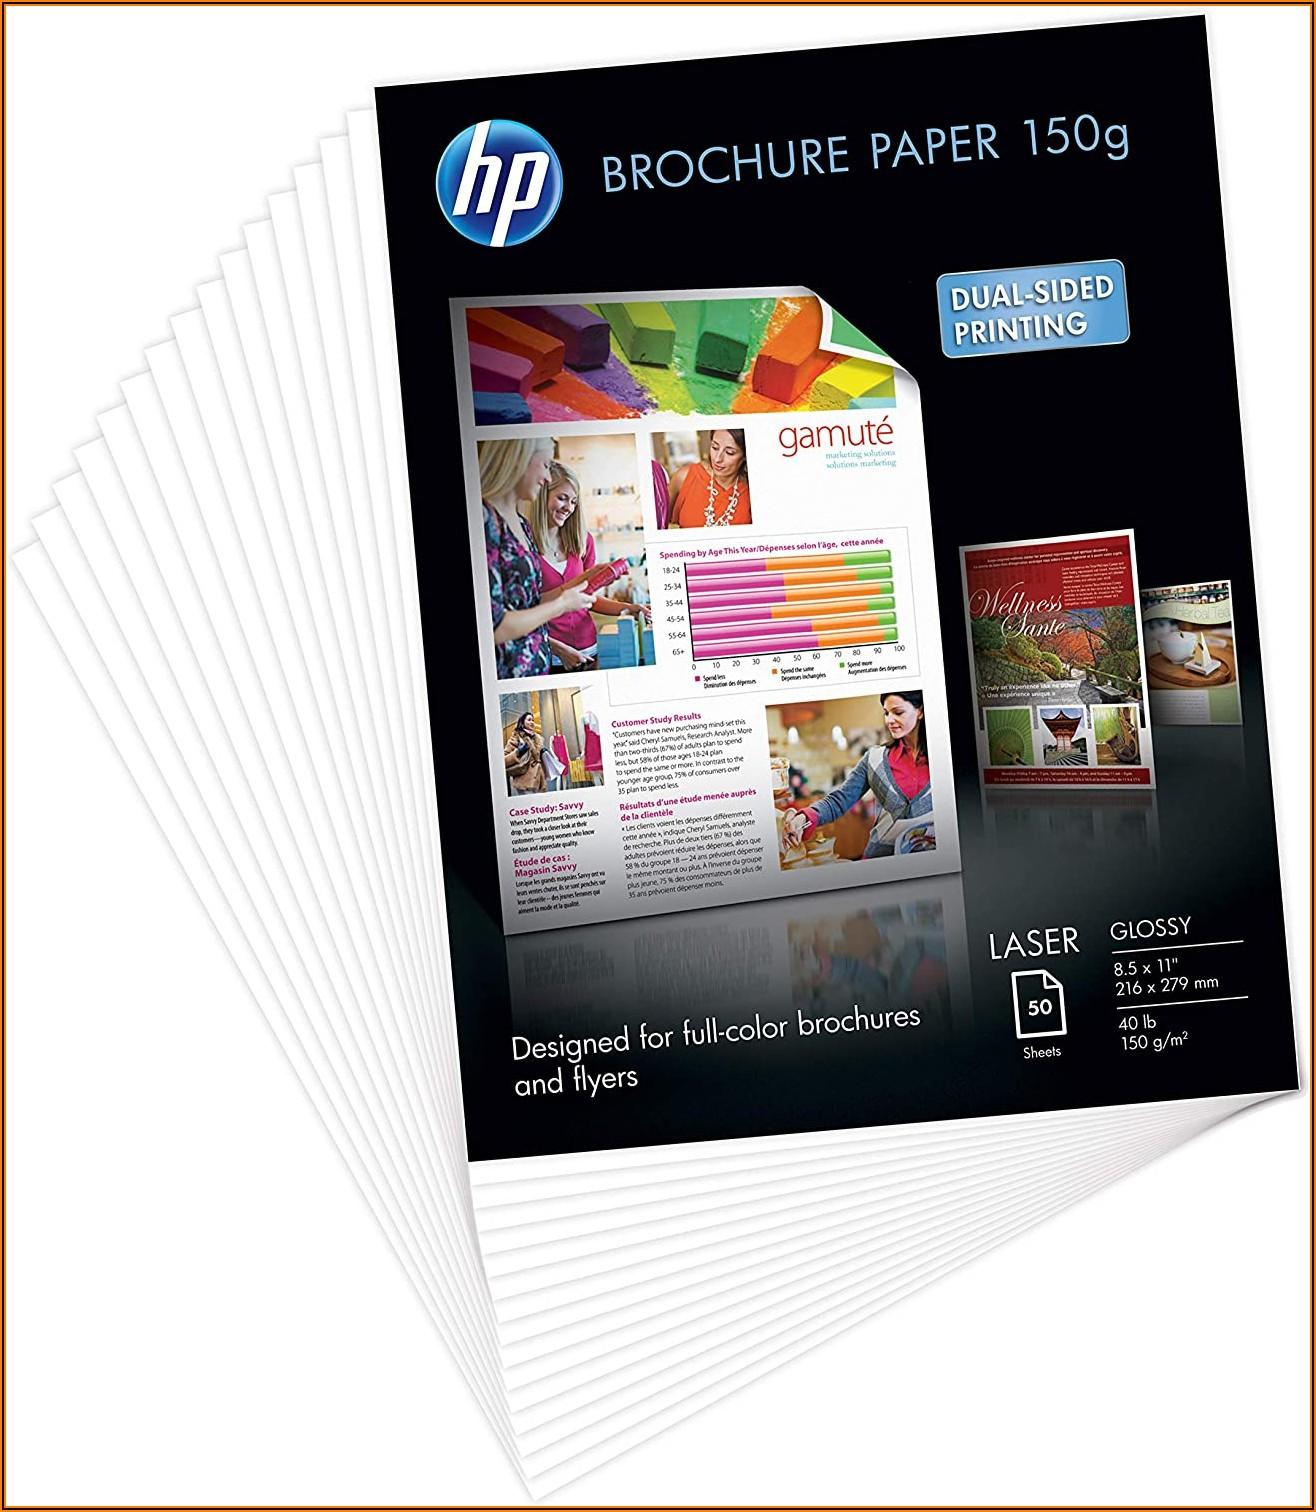 Hp Brochure Paper Glossy 8.5x11 150 Sheets